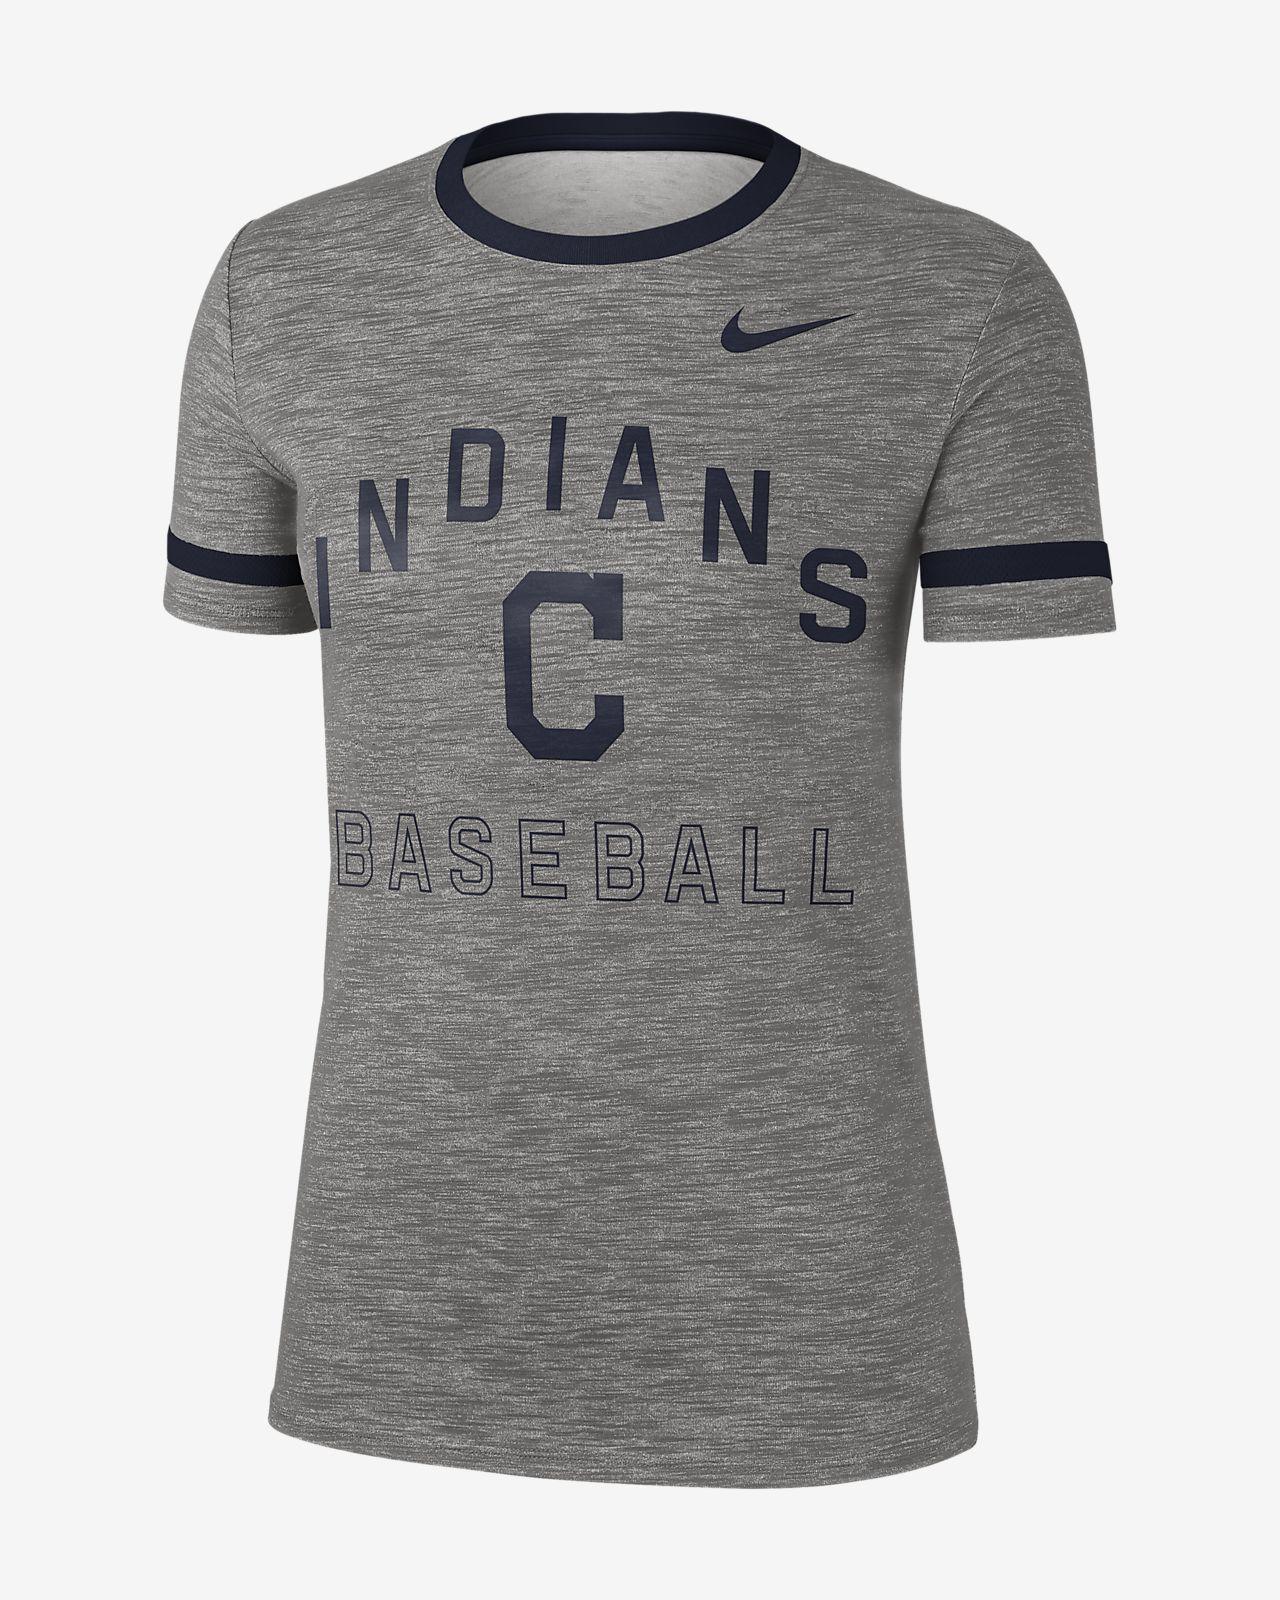 Nike Dri-FIT (MLB Indians) Women's T-Shirt